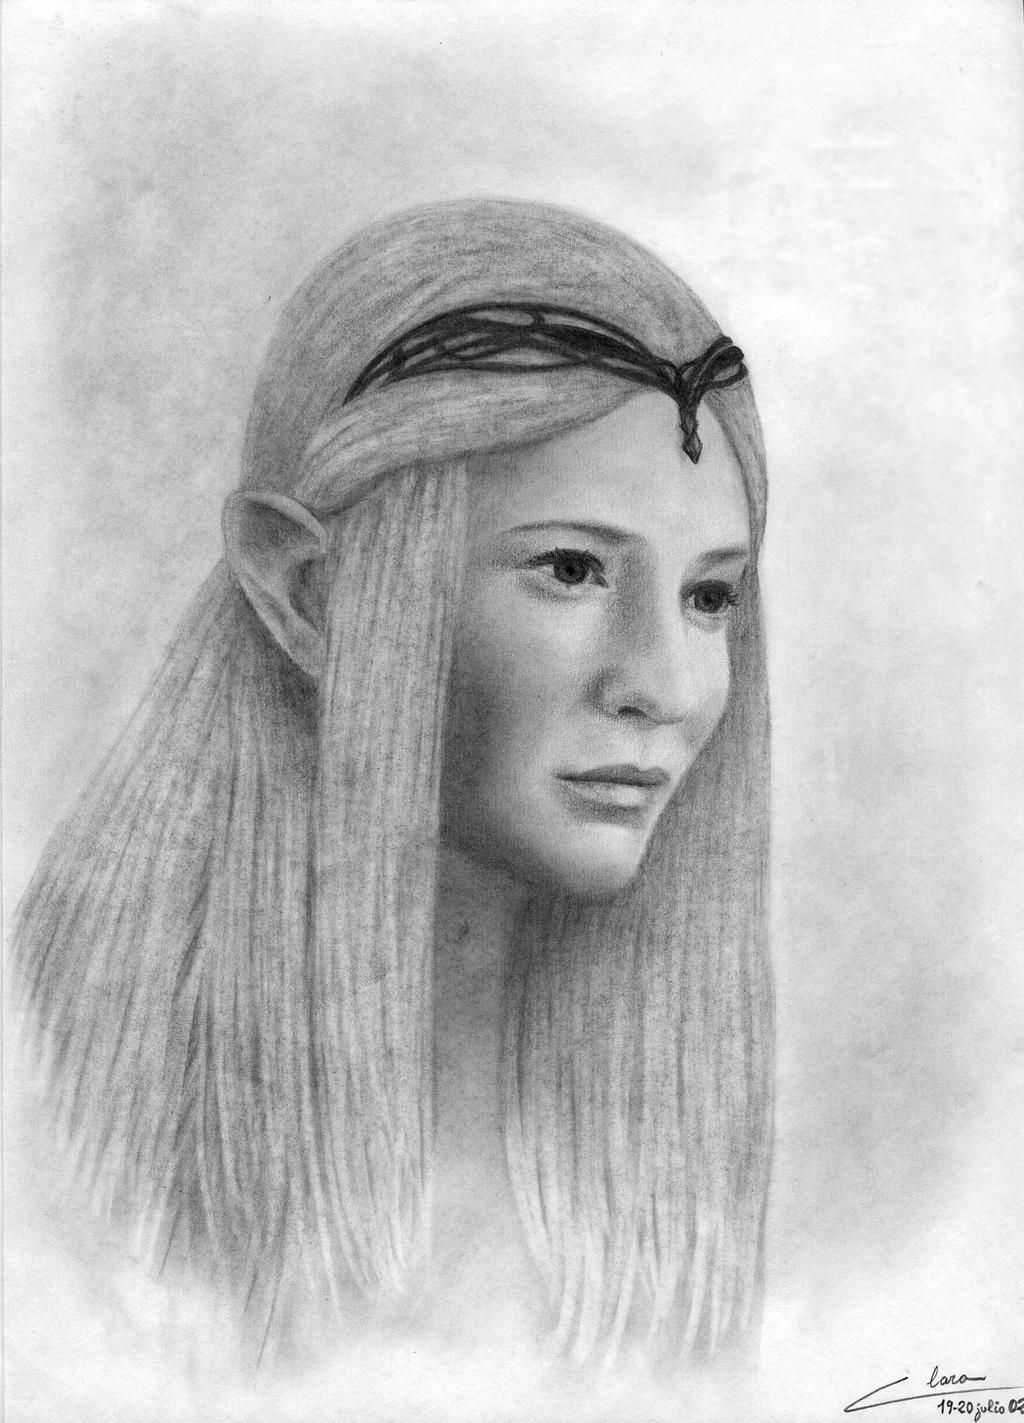 Cate Blanchett as Galadriel